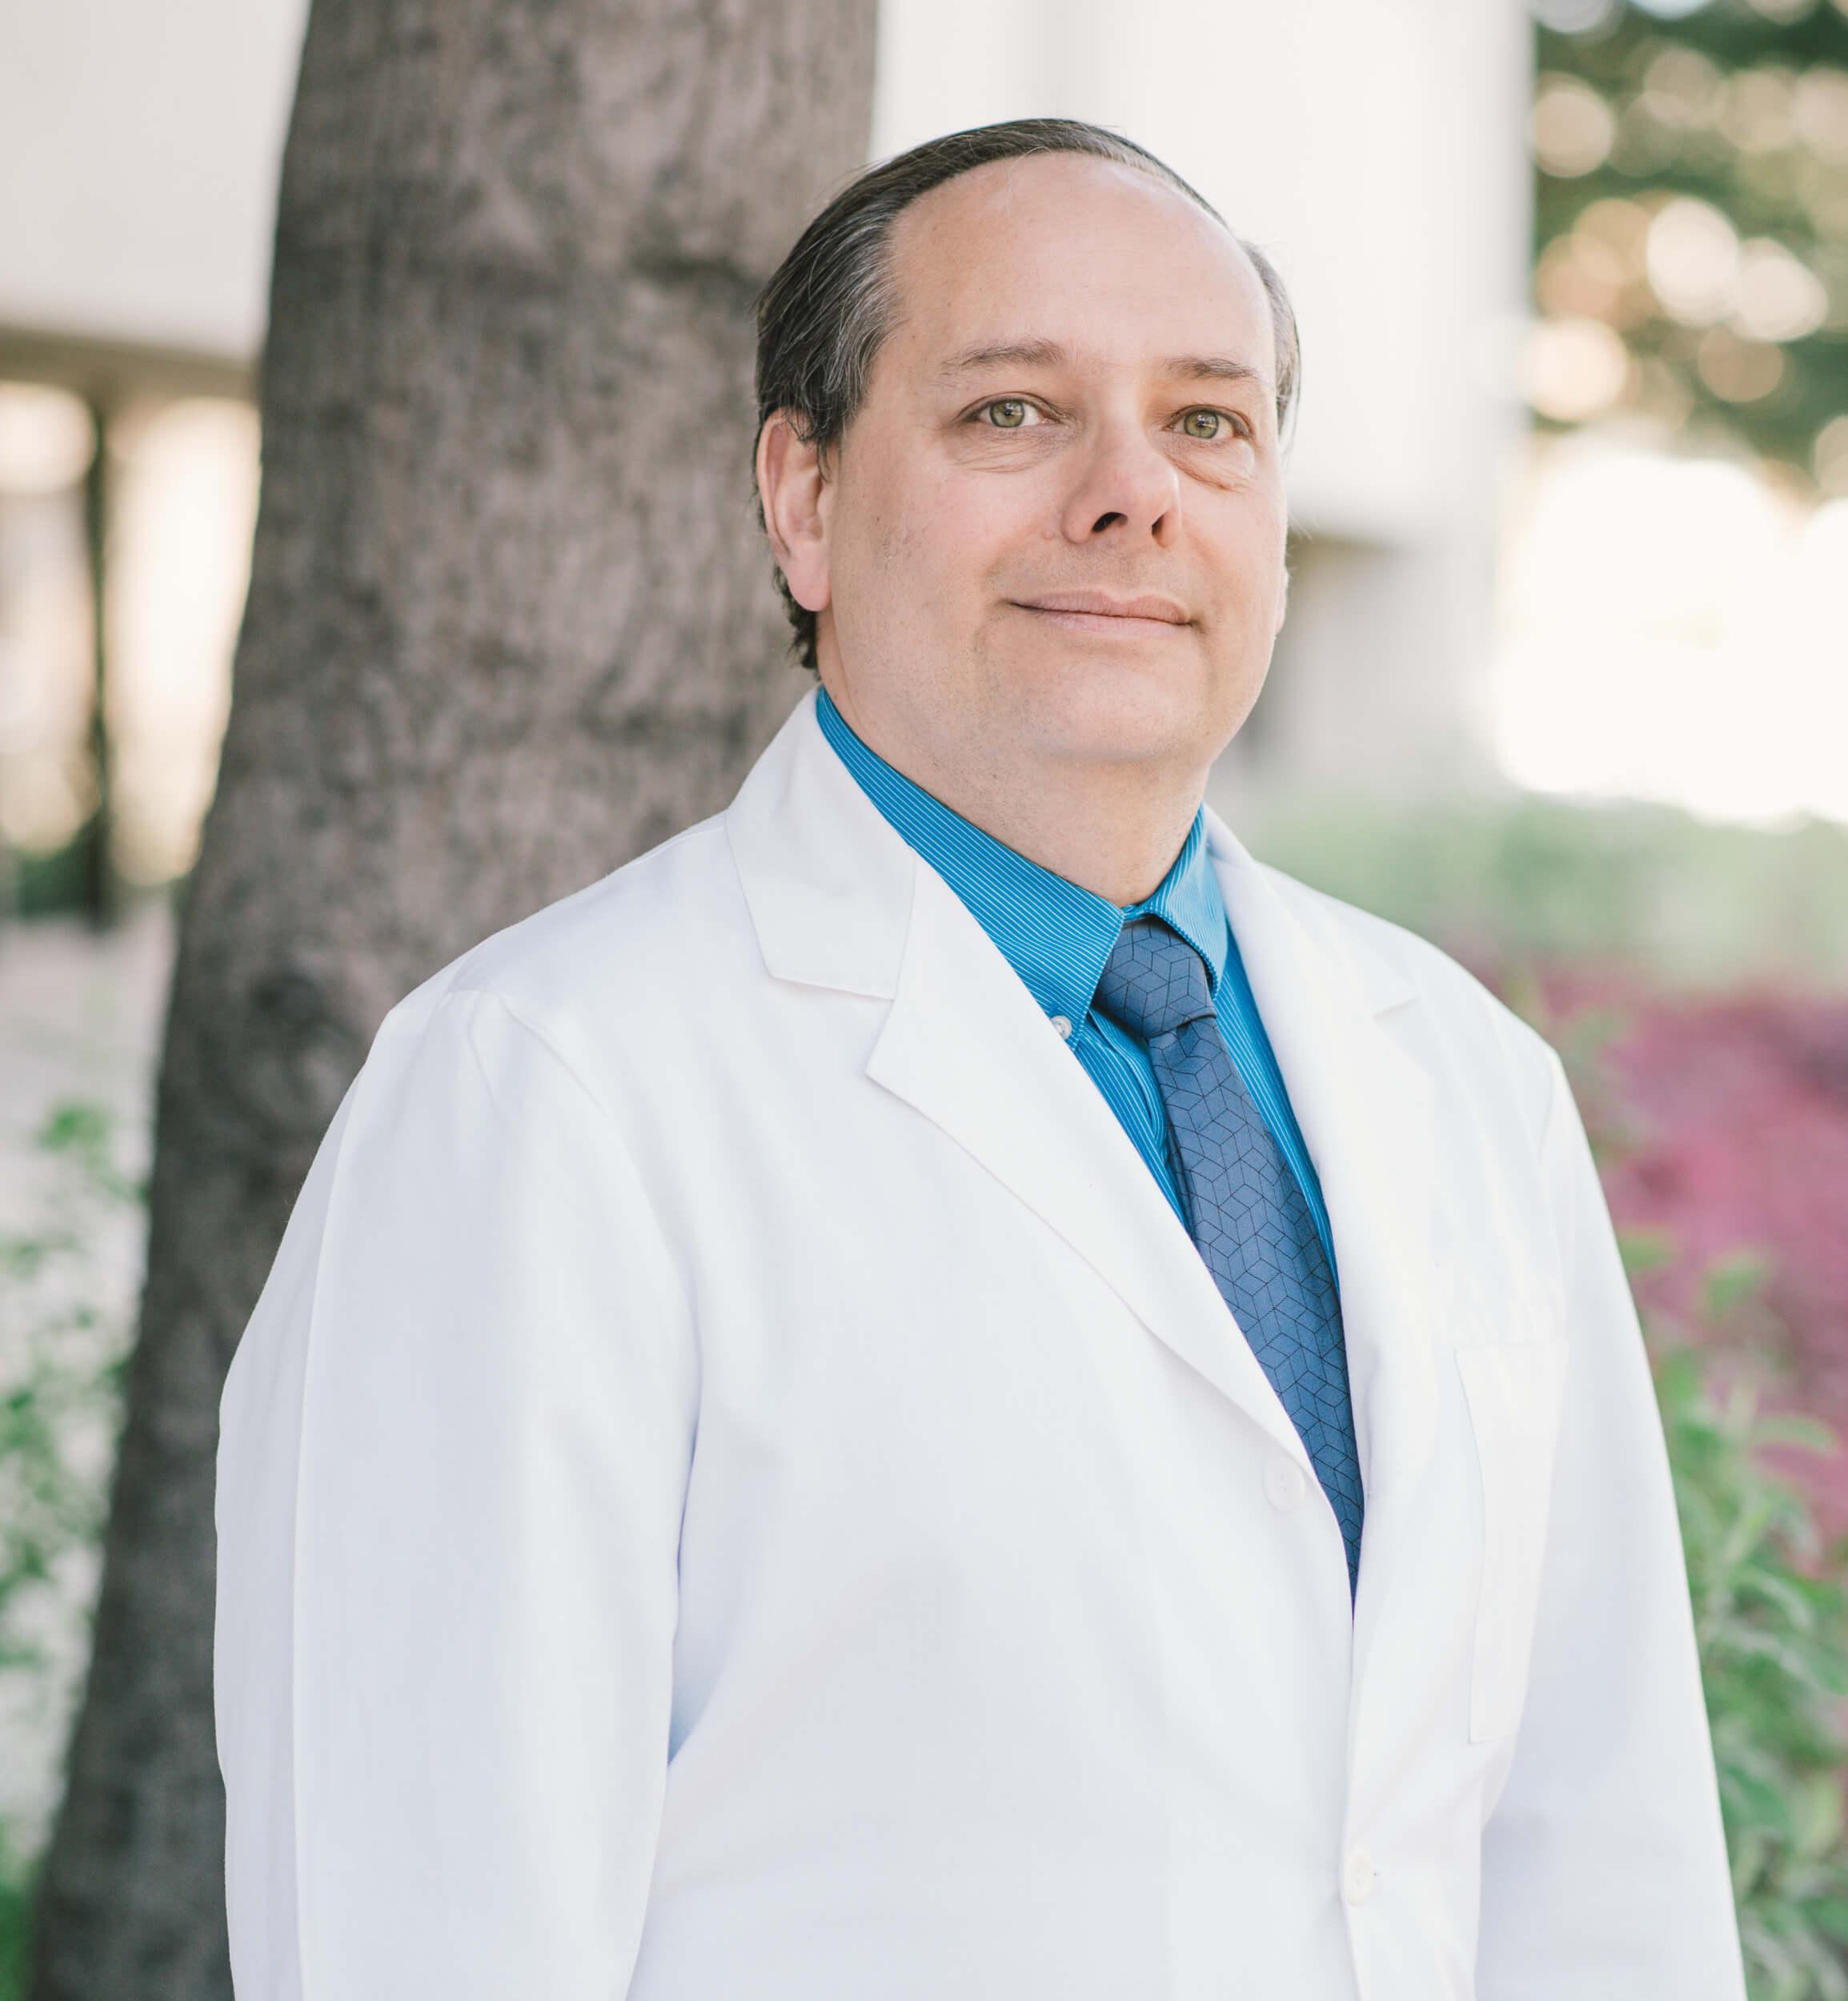 Scott Lipson, body imaging at bay imaging consultants